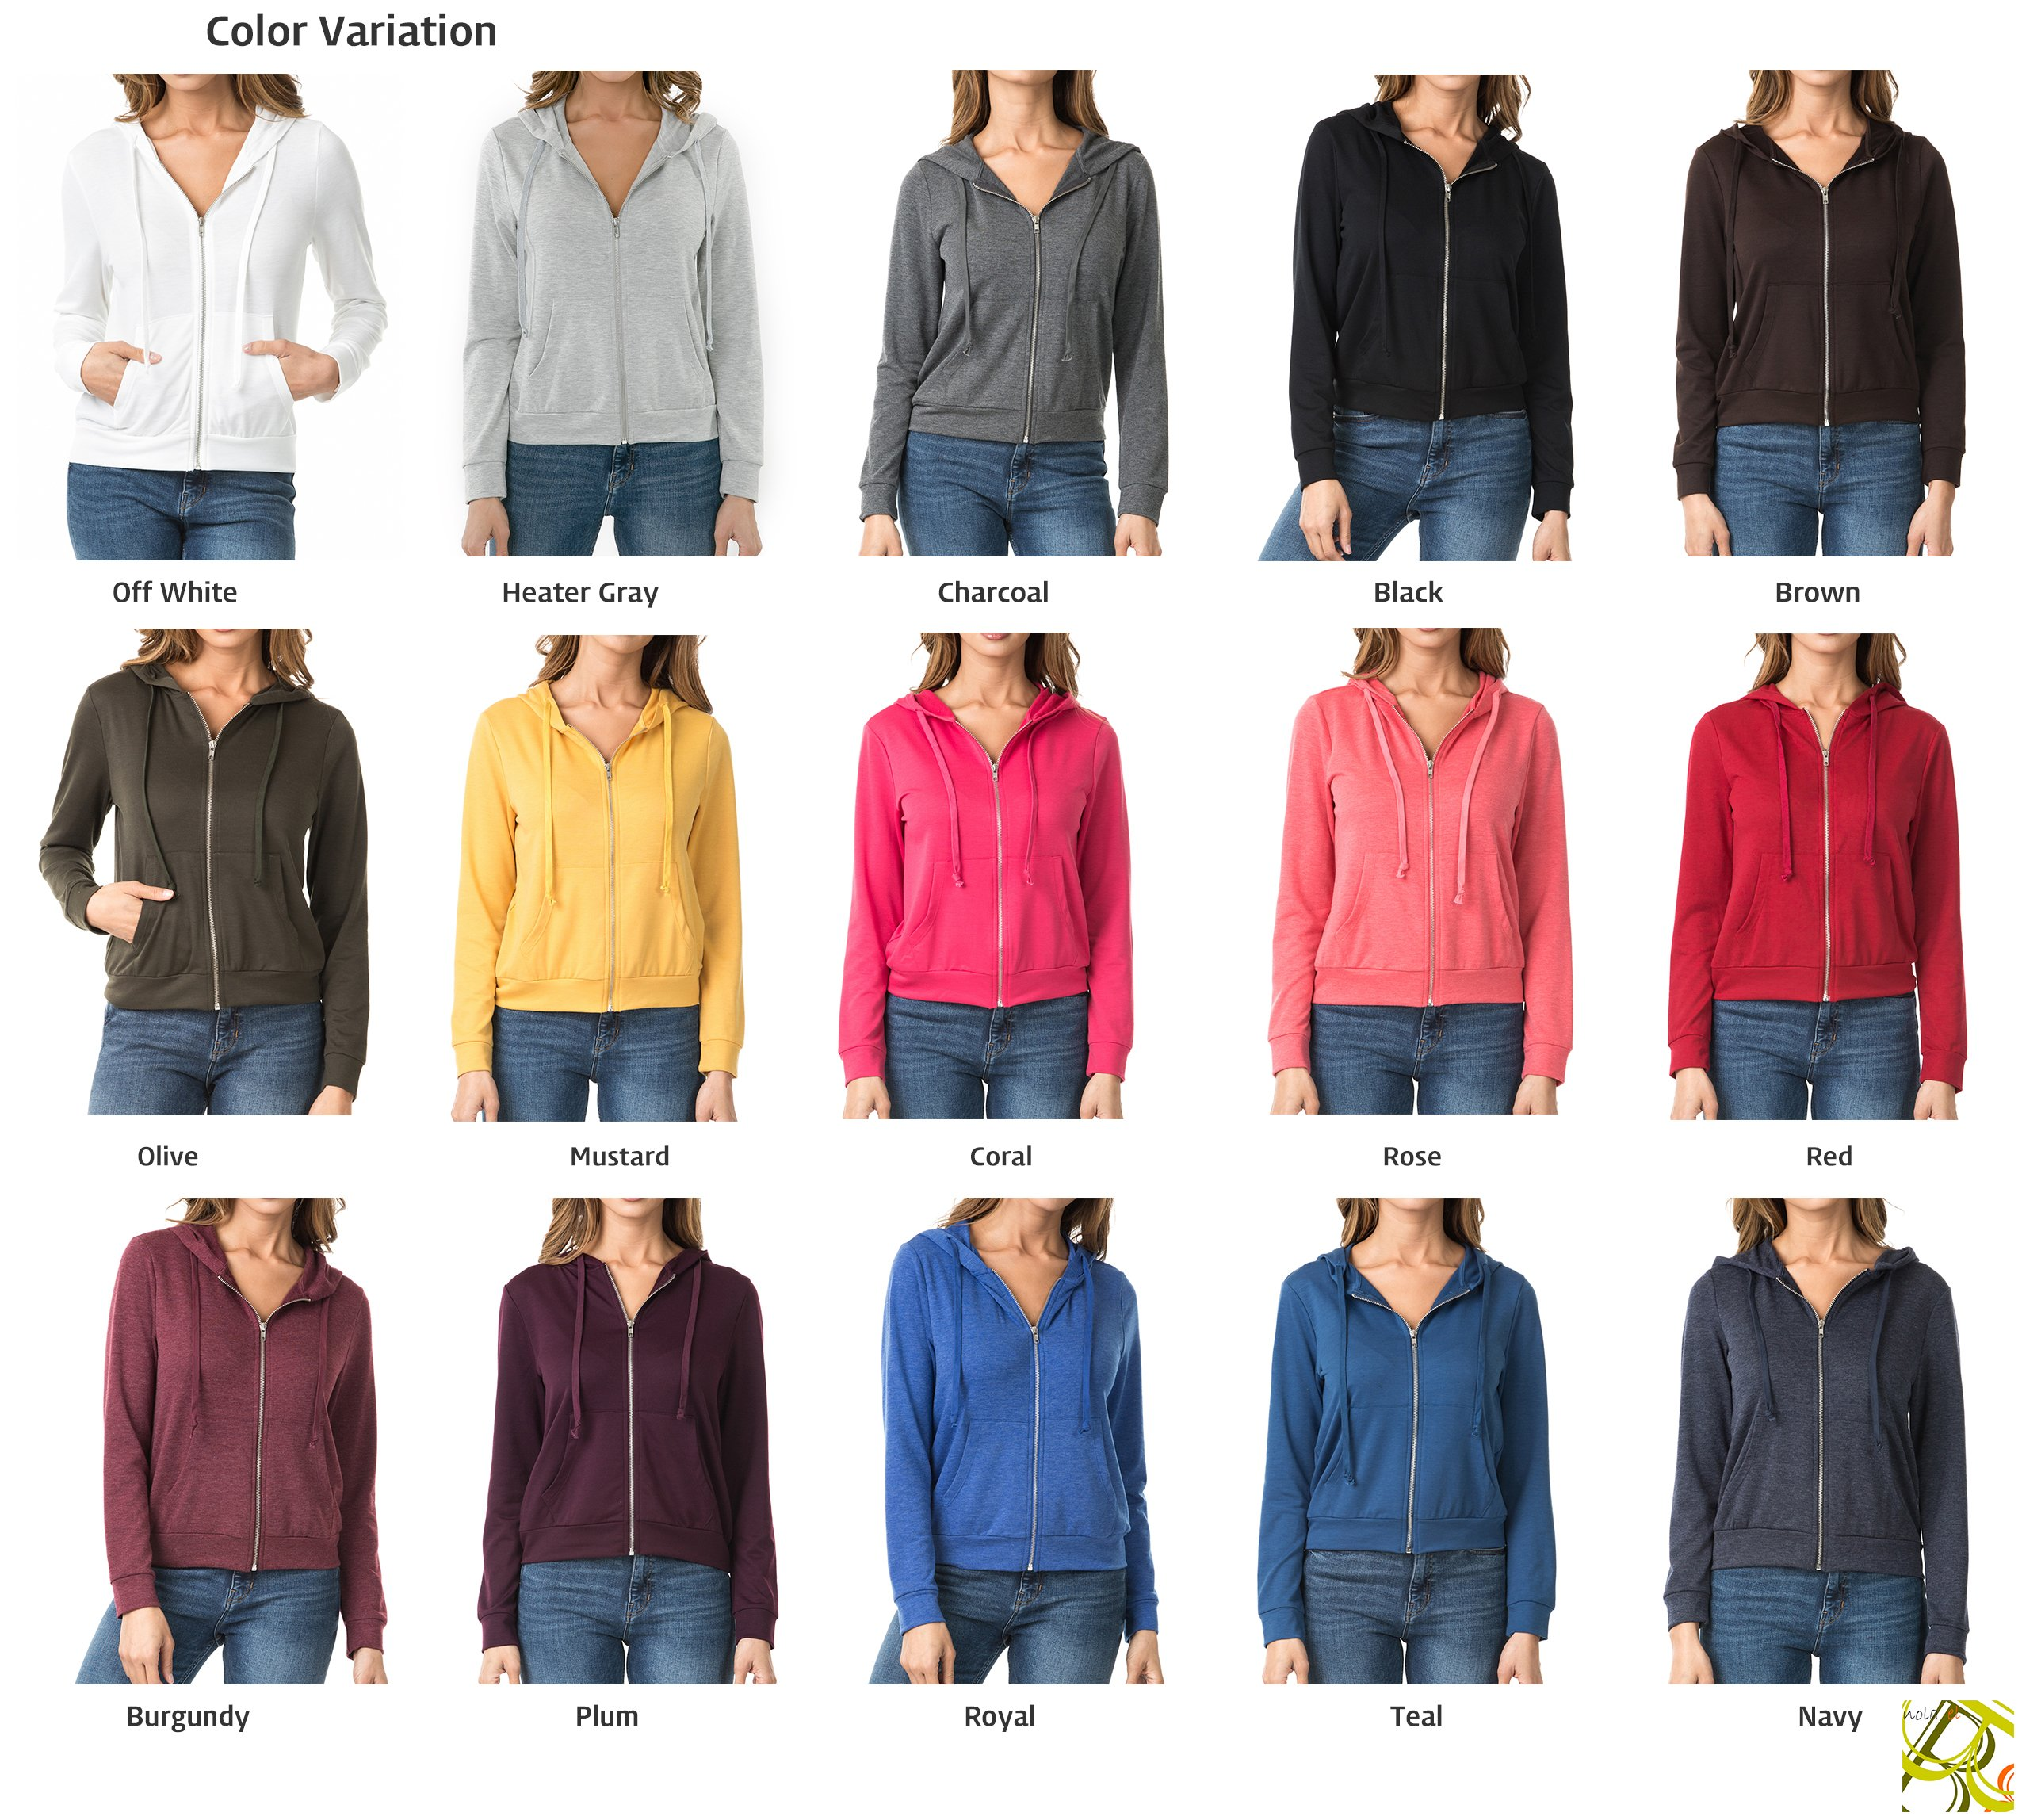 Nolabel B7_032 Women's Long Sleeve French Terry Drawstring Hoodies Zip Up Sweatshirt Hooded (Burgundy/5XL) by Nolabel (Image #5)